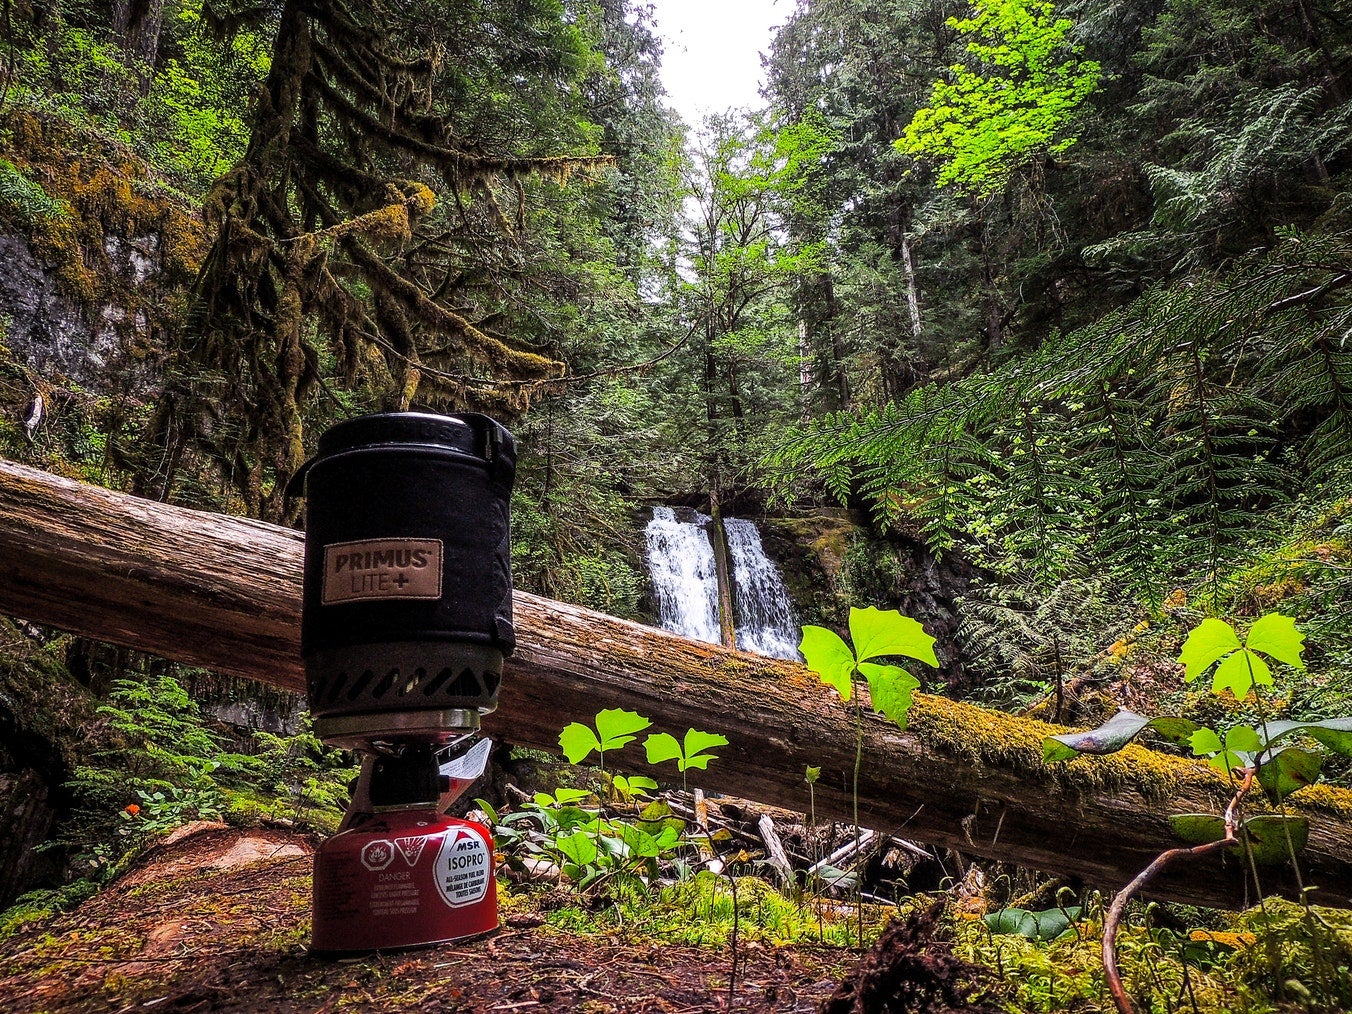 primus camp cookstove for kayak camping